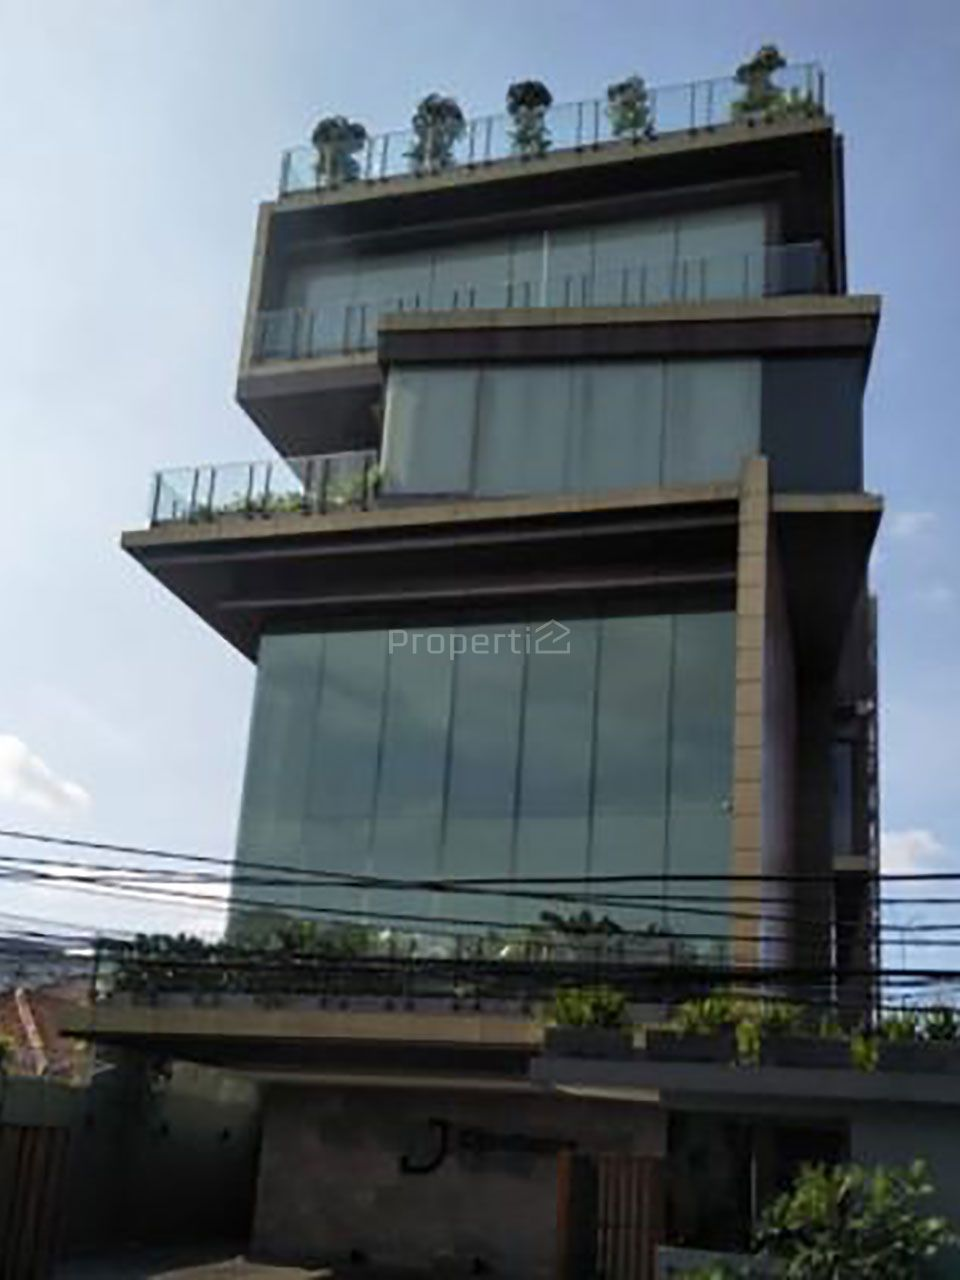 Strategic Building in Menteng, Central Jakarta, DKI Jakarta